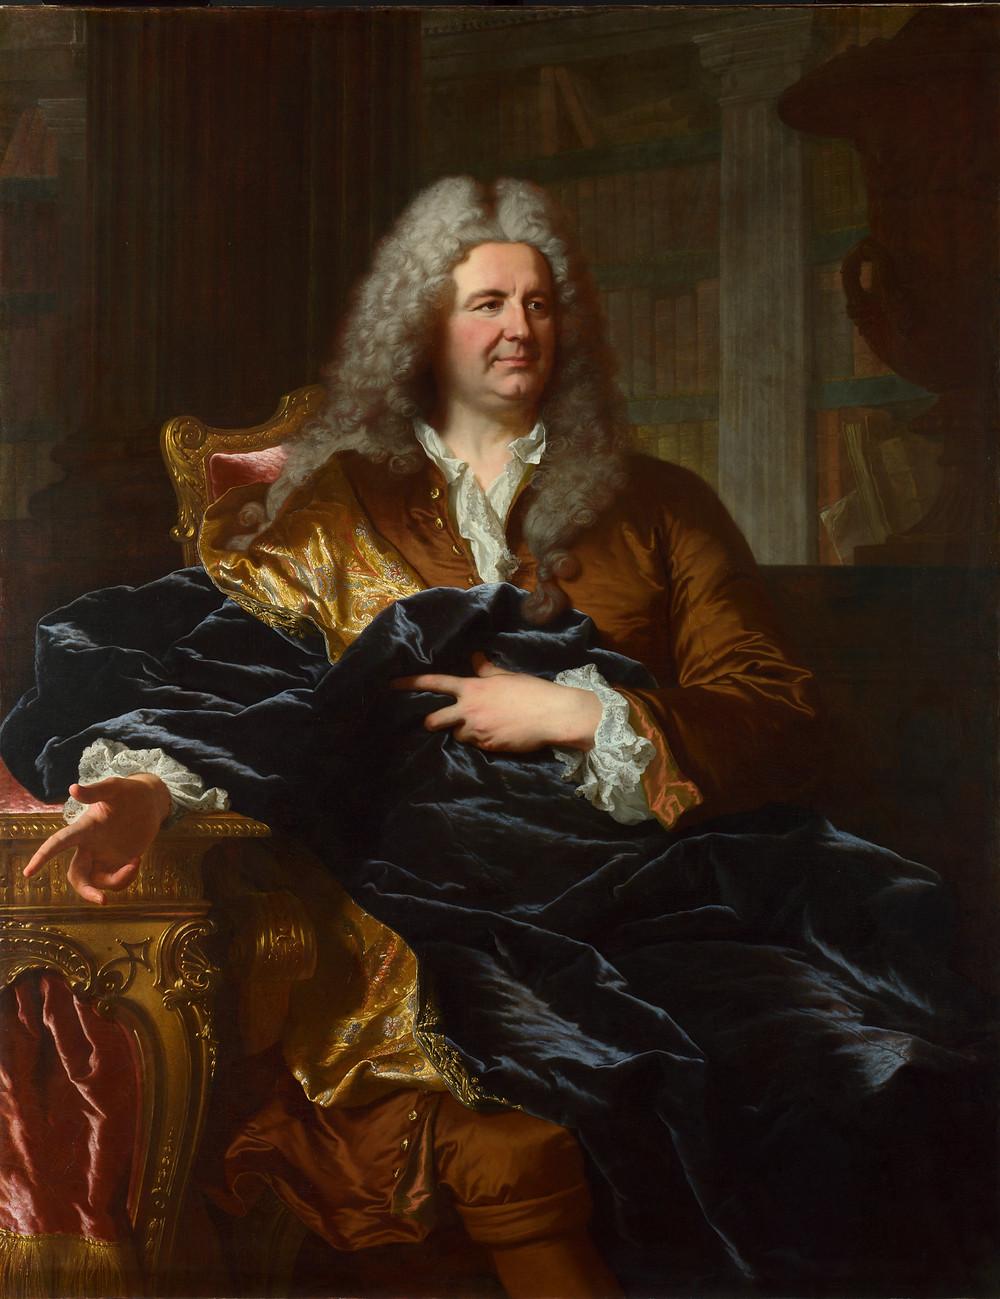 Hyacinthe Rigaud, Portrait d'Antoine Pâris, 1724, Londres, National Gallery, inv. NG 6428